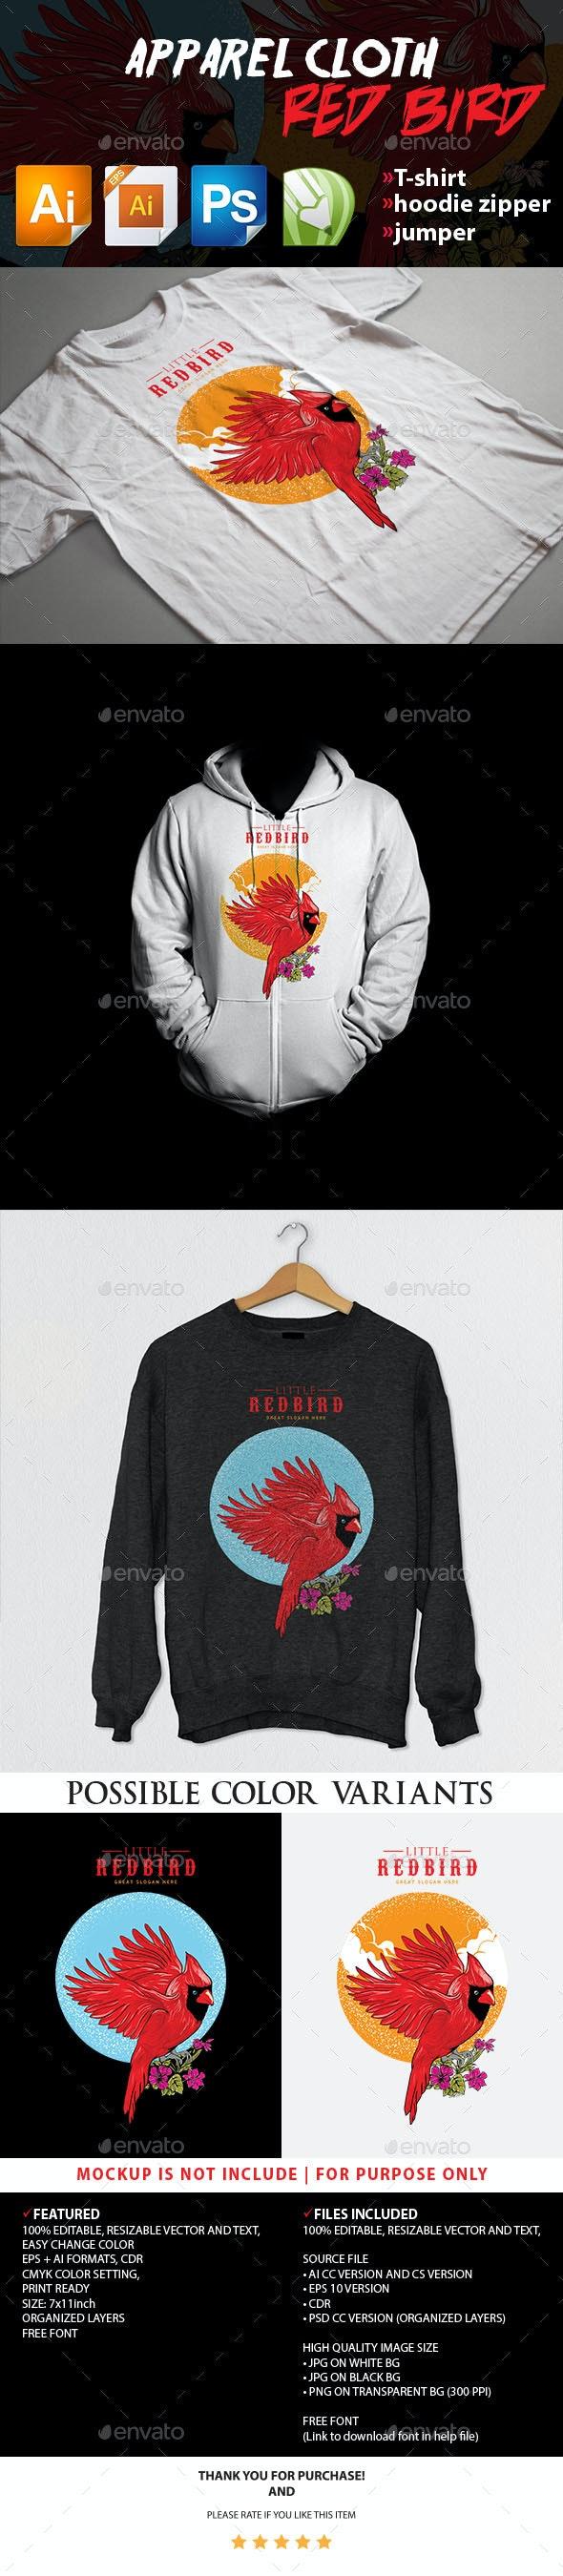 Red Bird Apparel Cloth - T-Shirts